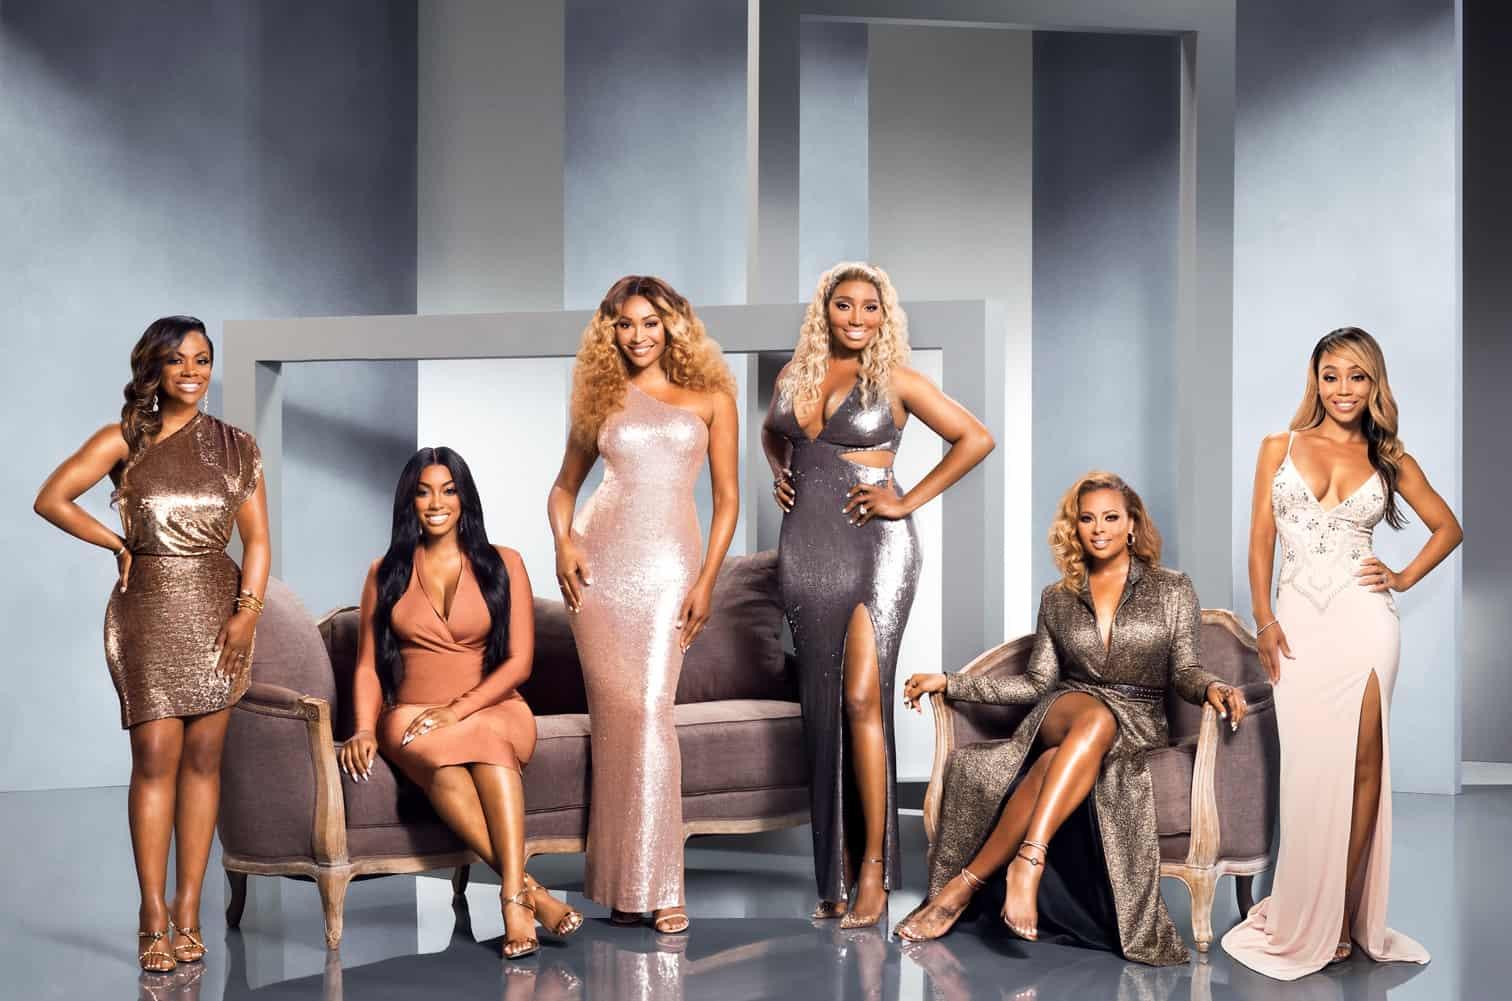 The Real Housewives of Atlanta Season 11 Cast Photo - Cynthia Bailey, Kandi Burruss, NeNe Leakes, Porsha Williams, Eva Marcille and Shamari DeVoe